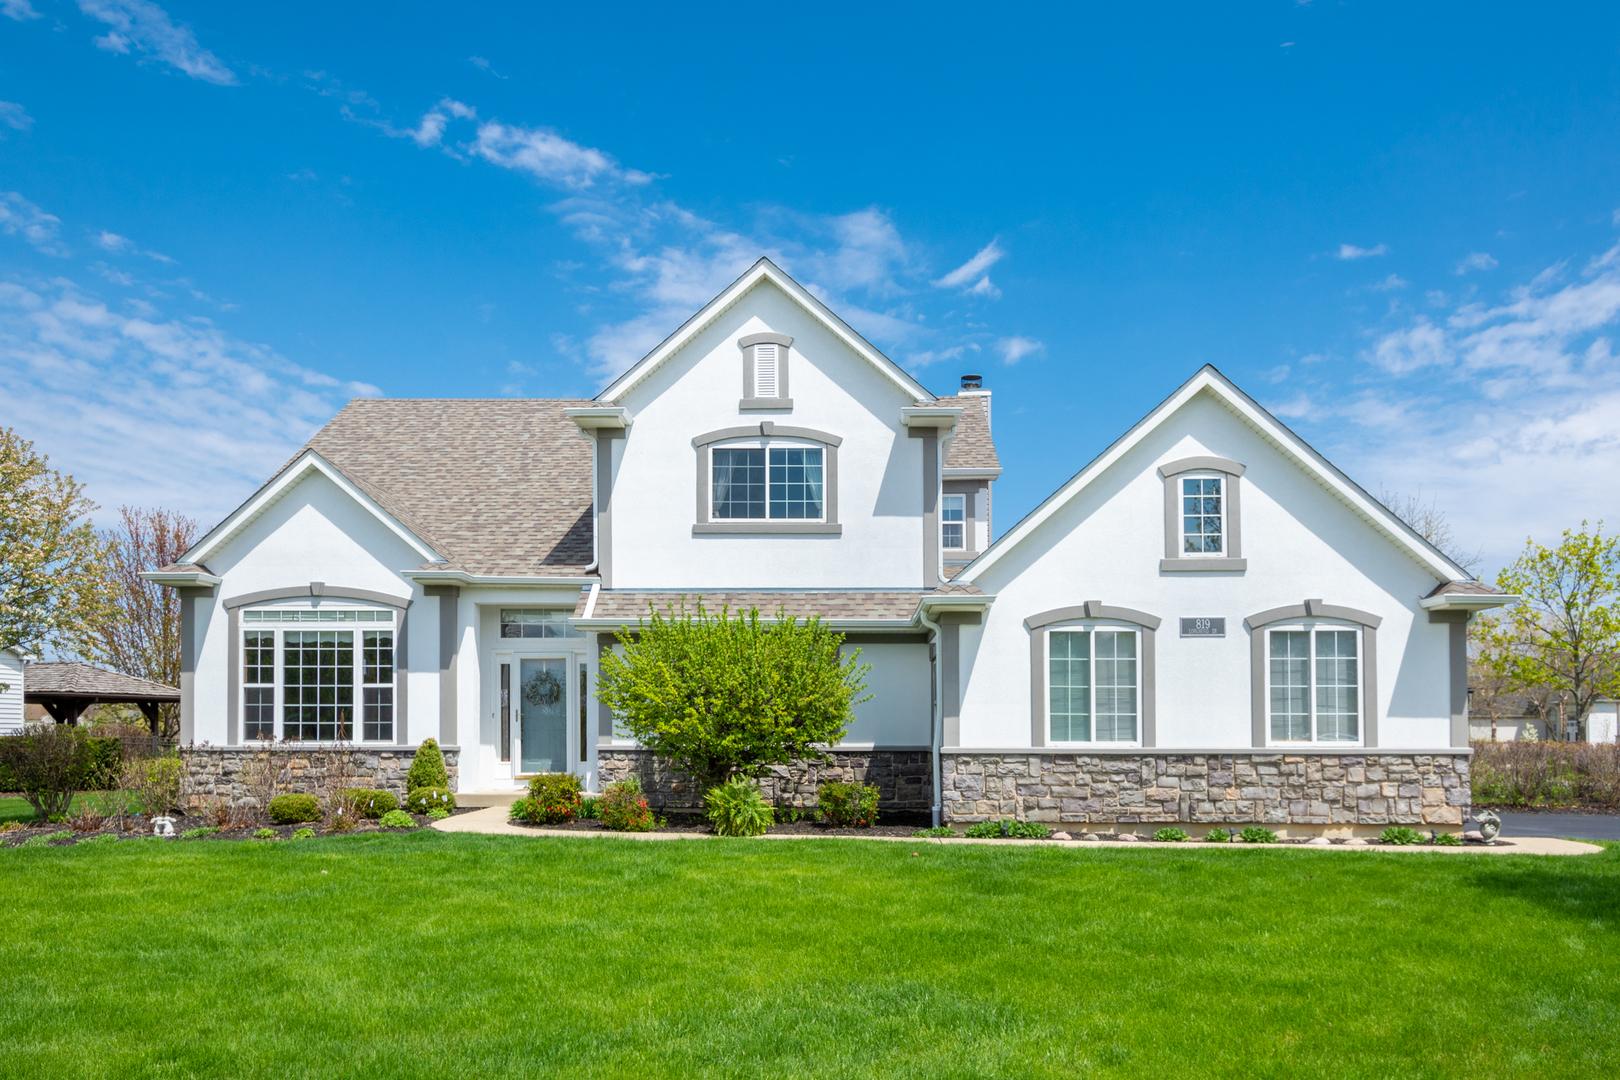 819 Longwood Drive, Lake Villa, Illinois 60046